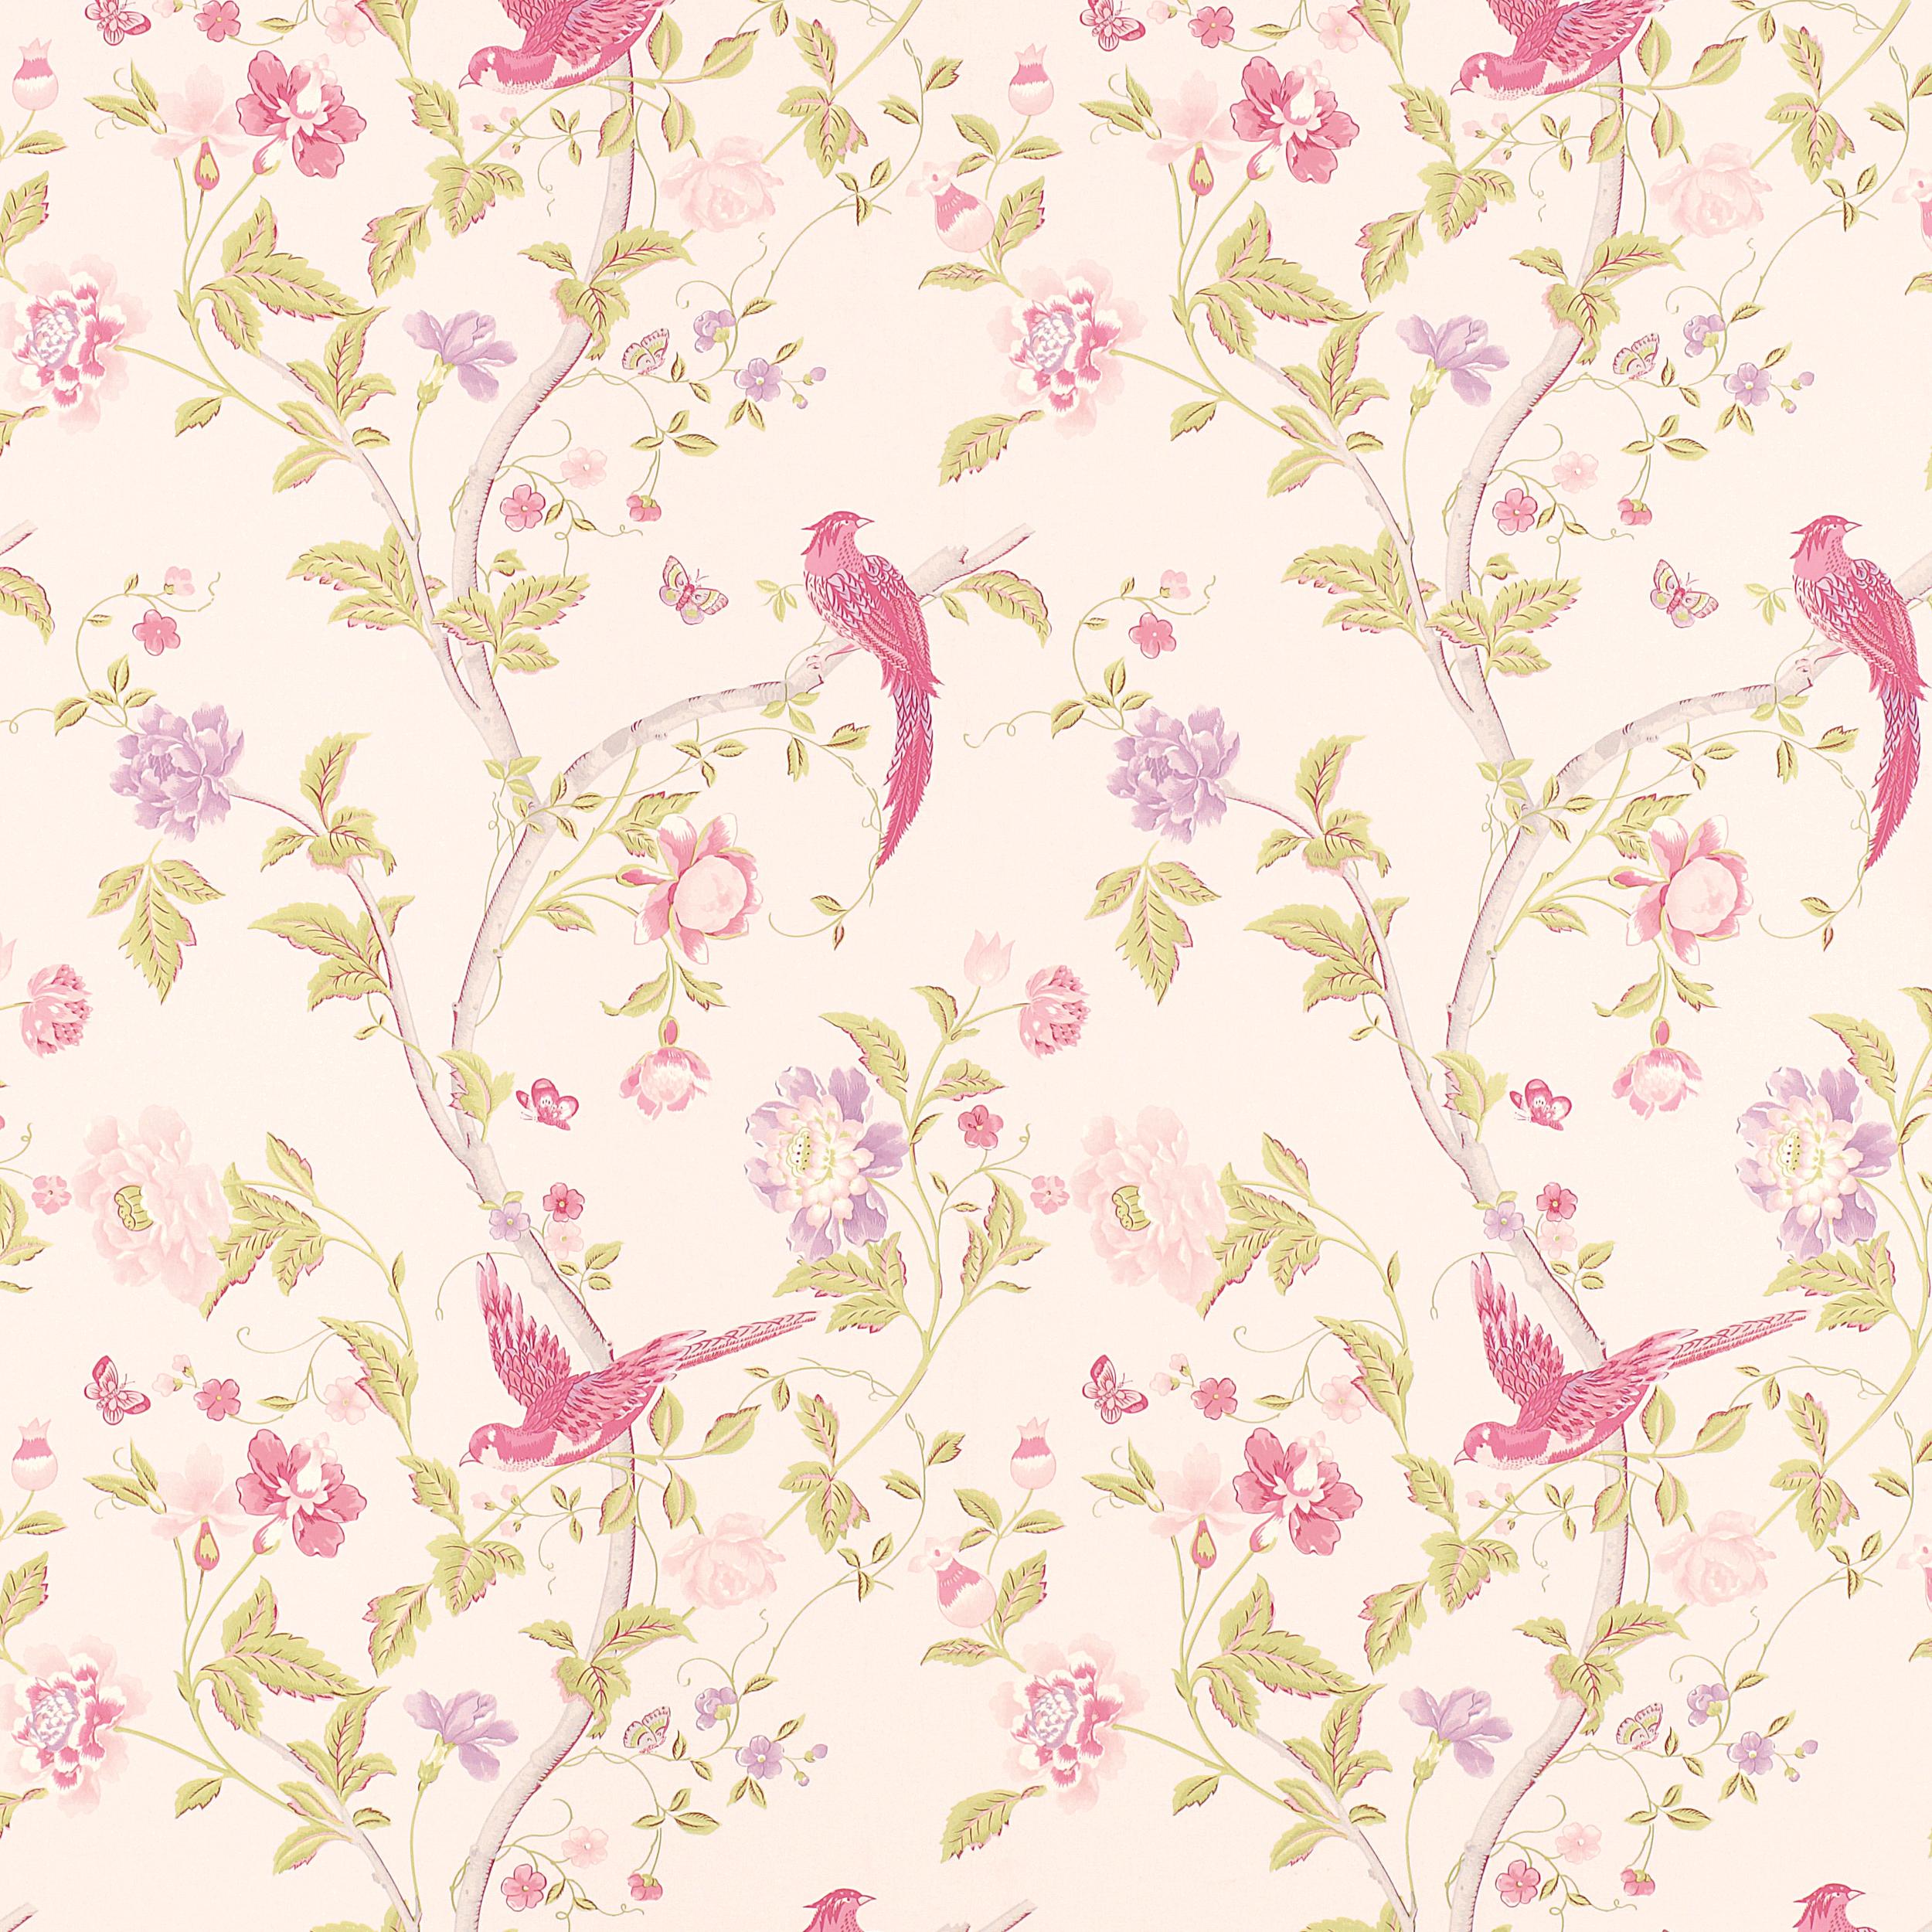 Free Download Desktop Wallpaper Vintage Flowers 3d Hd Pictures